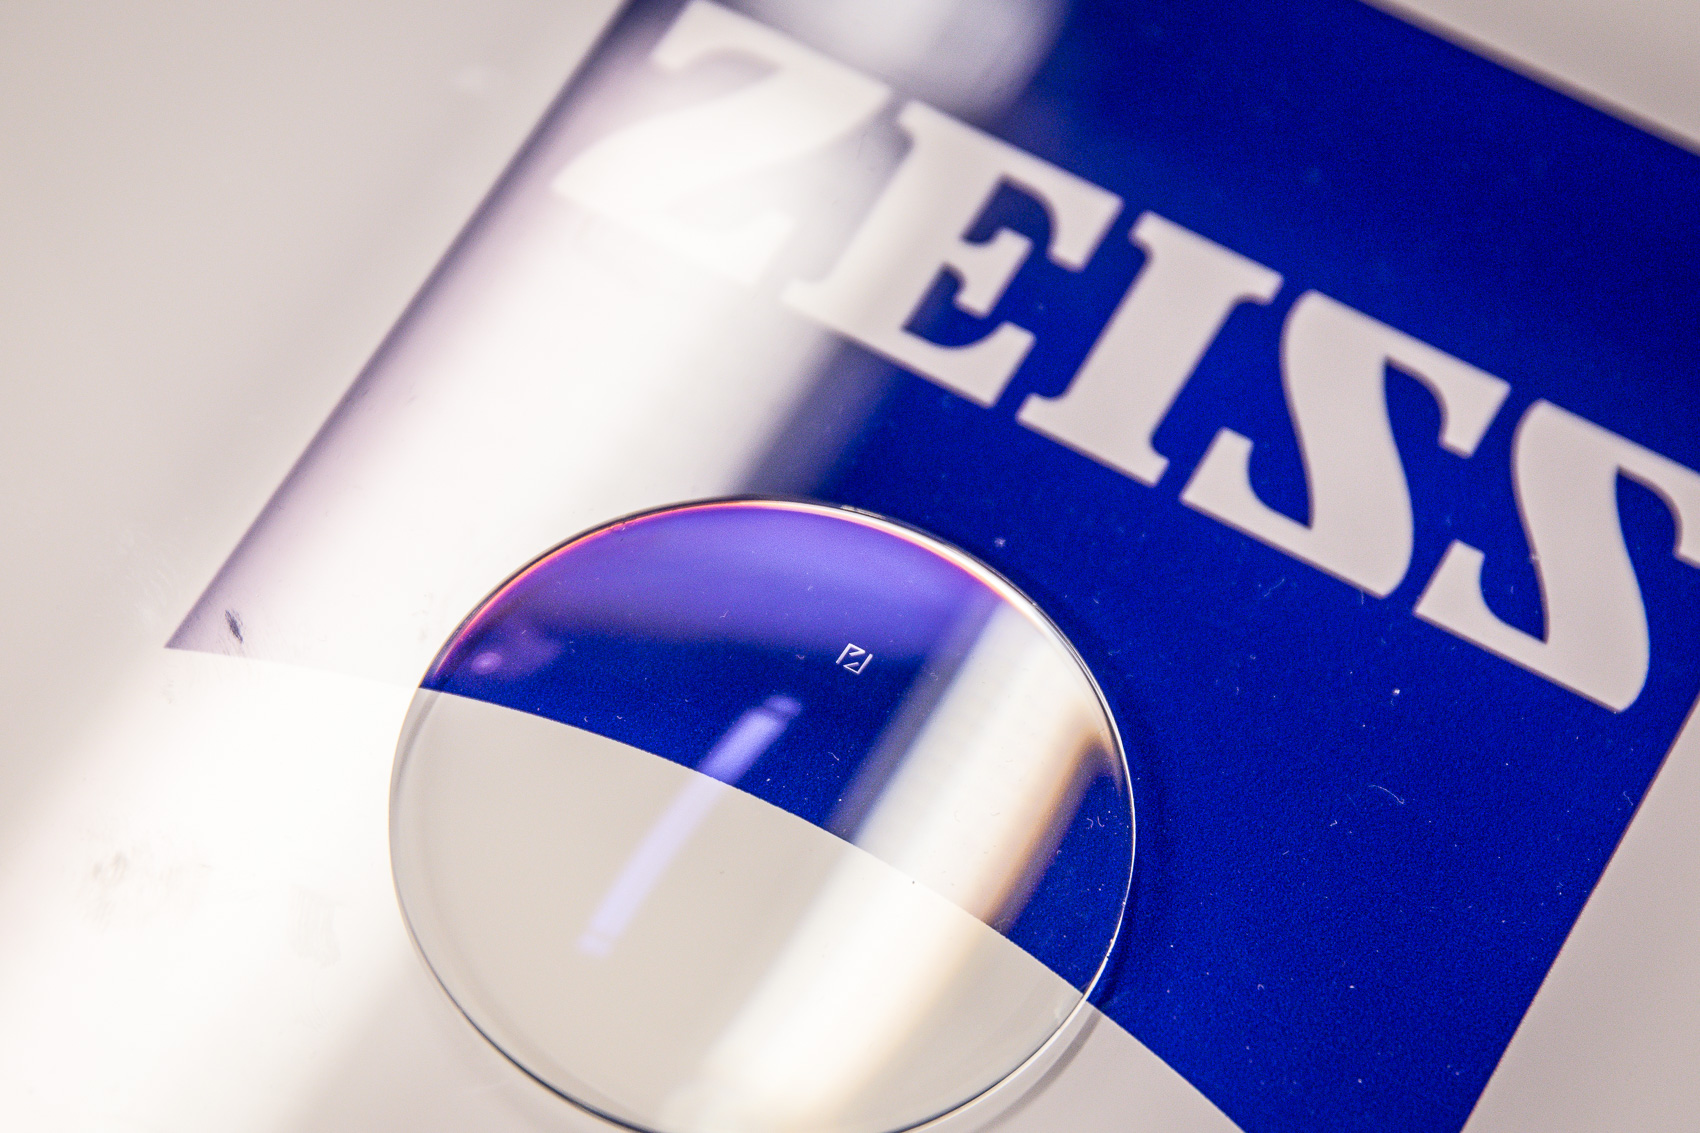 Zeiss linssit silmälasilinssi laatulinssit optikko zeissvision zeisslenses